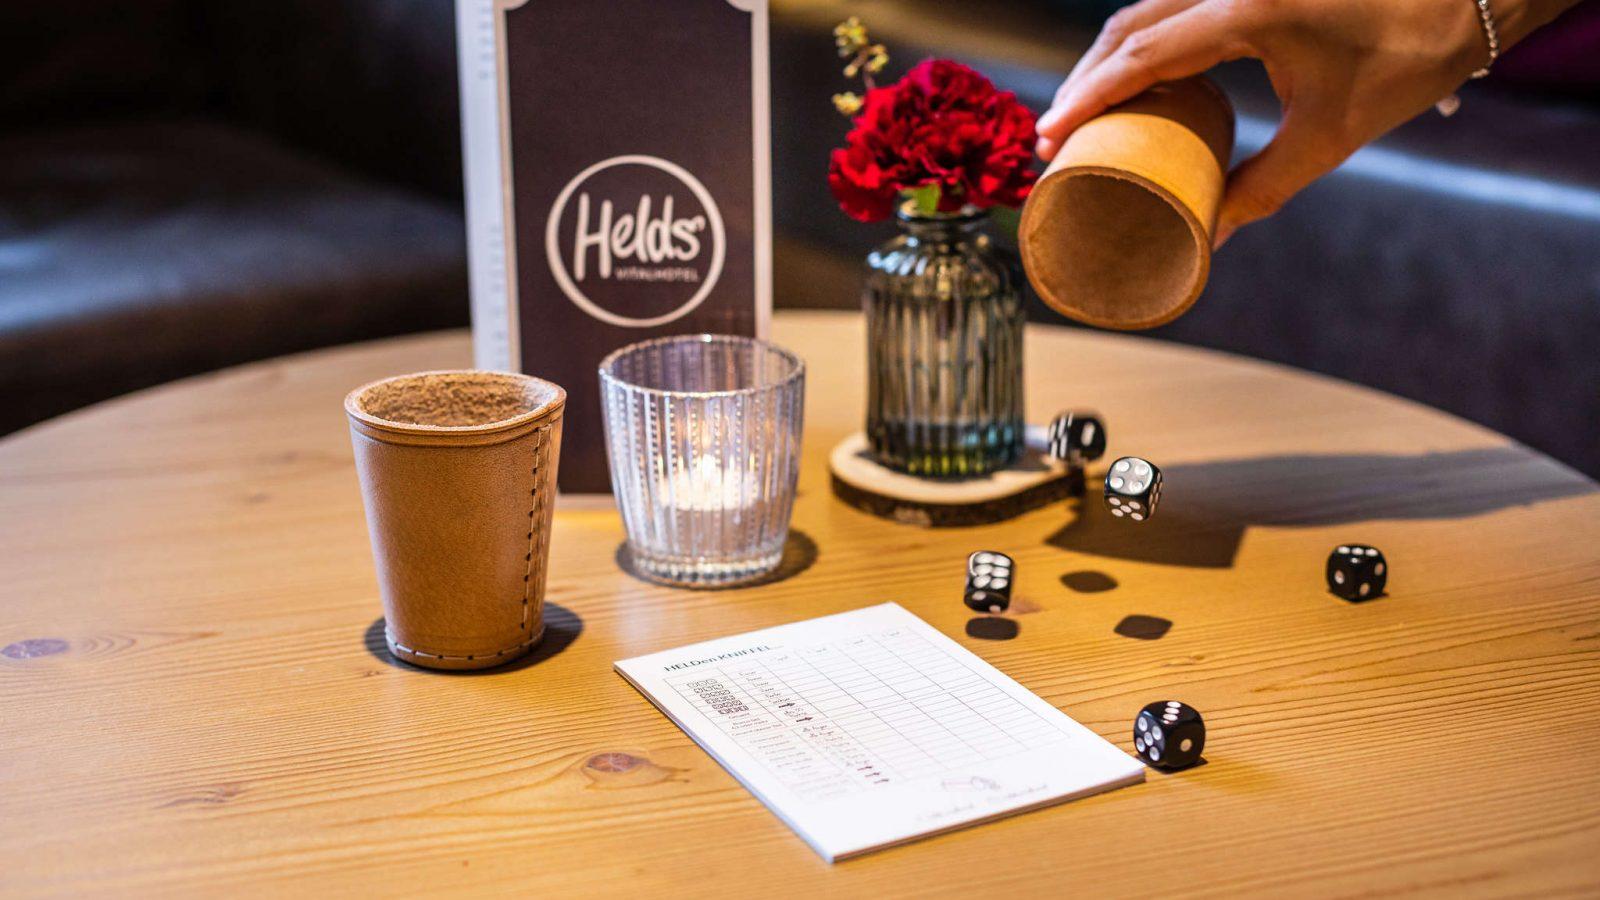 helds-vitalhotel-ruhpolding-bar_wuerfelspiel